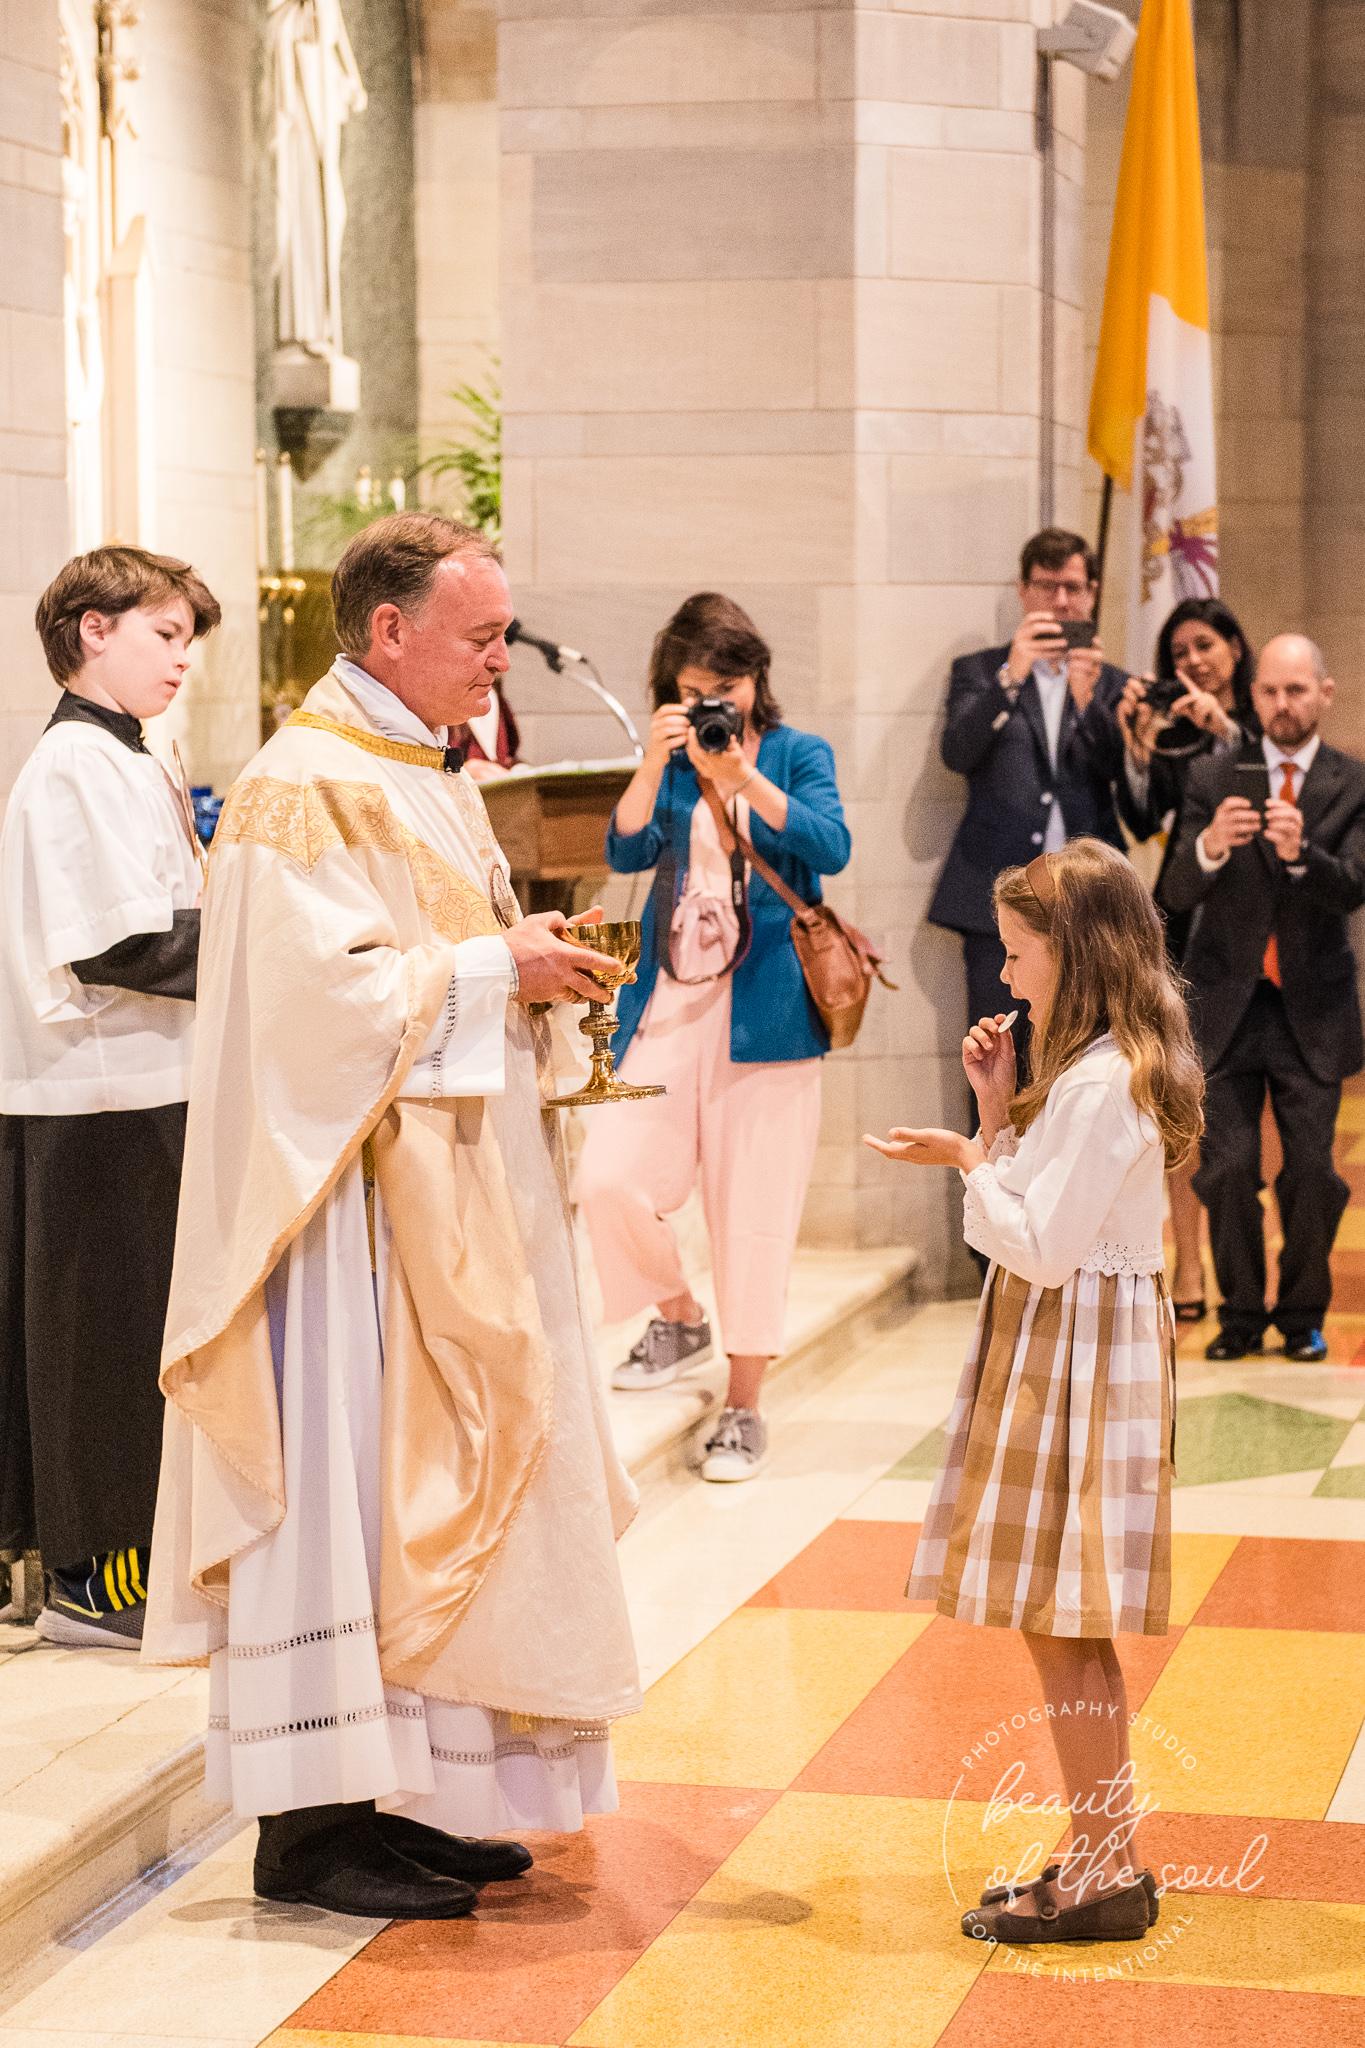 washington-dc-st-ann-catholic-church-first-holy-communion-beauty-of-the-soul-studio-may-2019-17.jpg